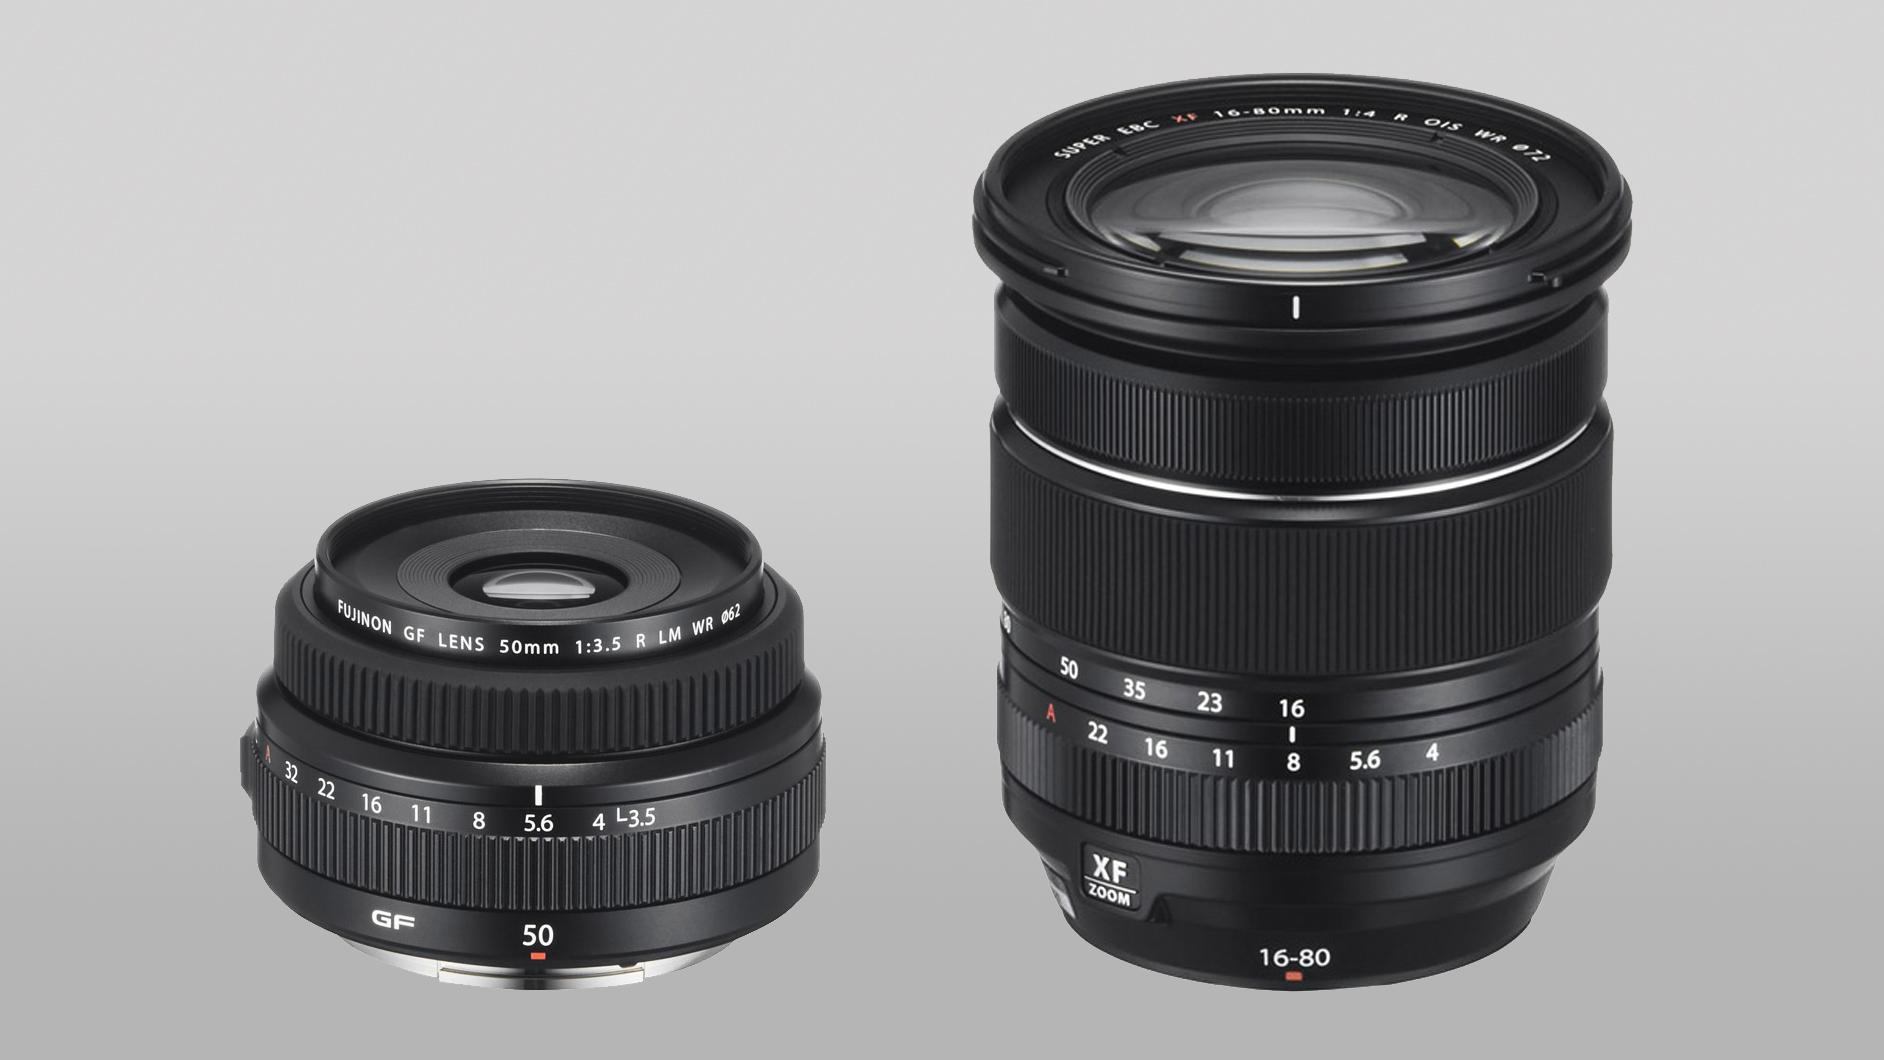 Two new Fuji lenses leak: Fujinon GF 50mm f/3.5 and Fujifilm XF 16-80mm f/4 | Digital Camera World